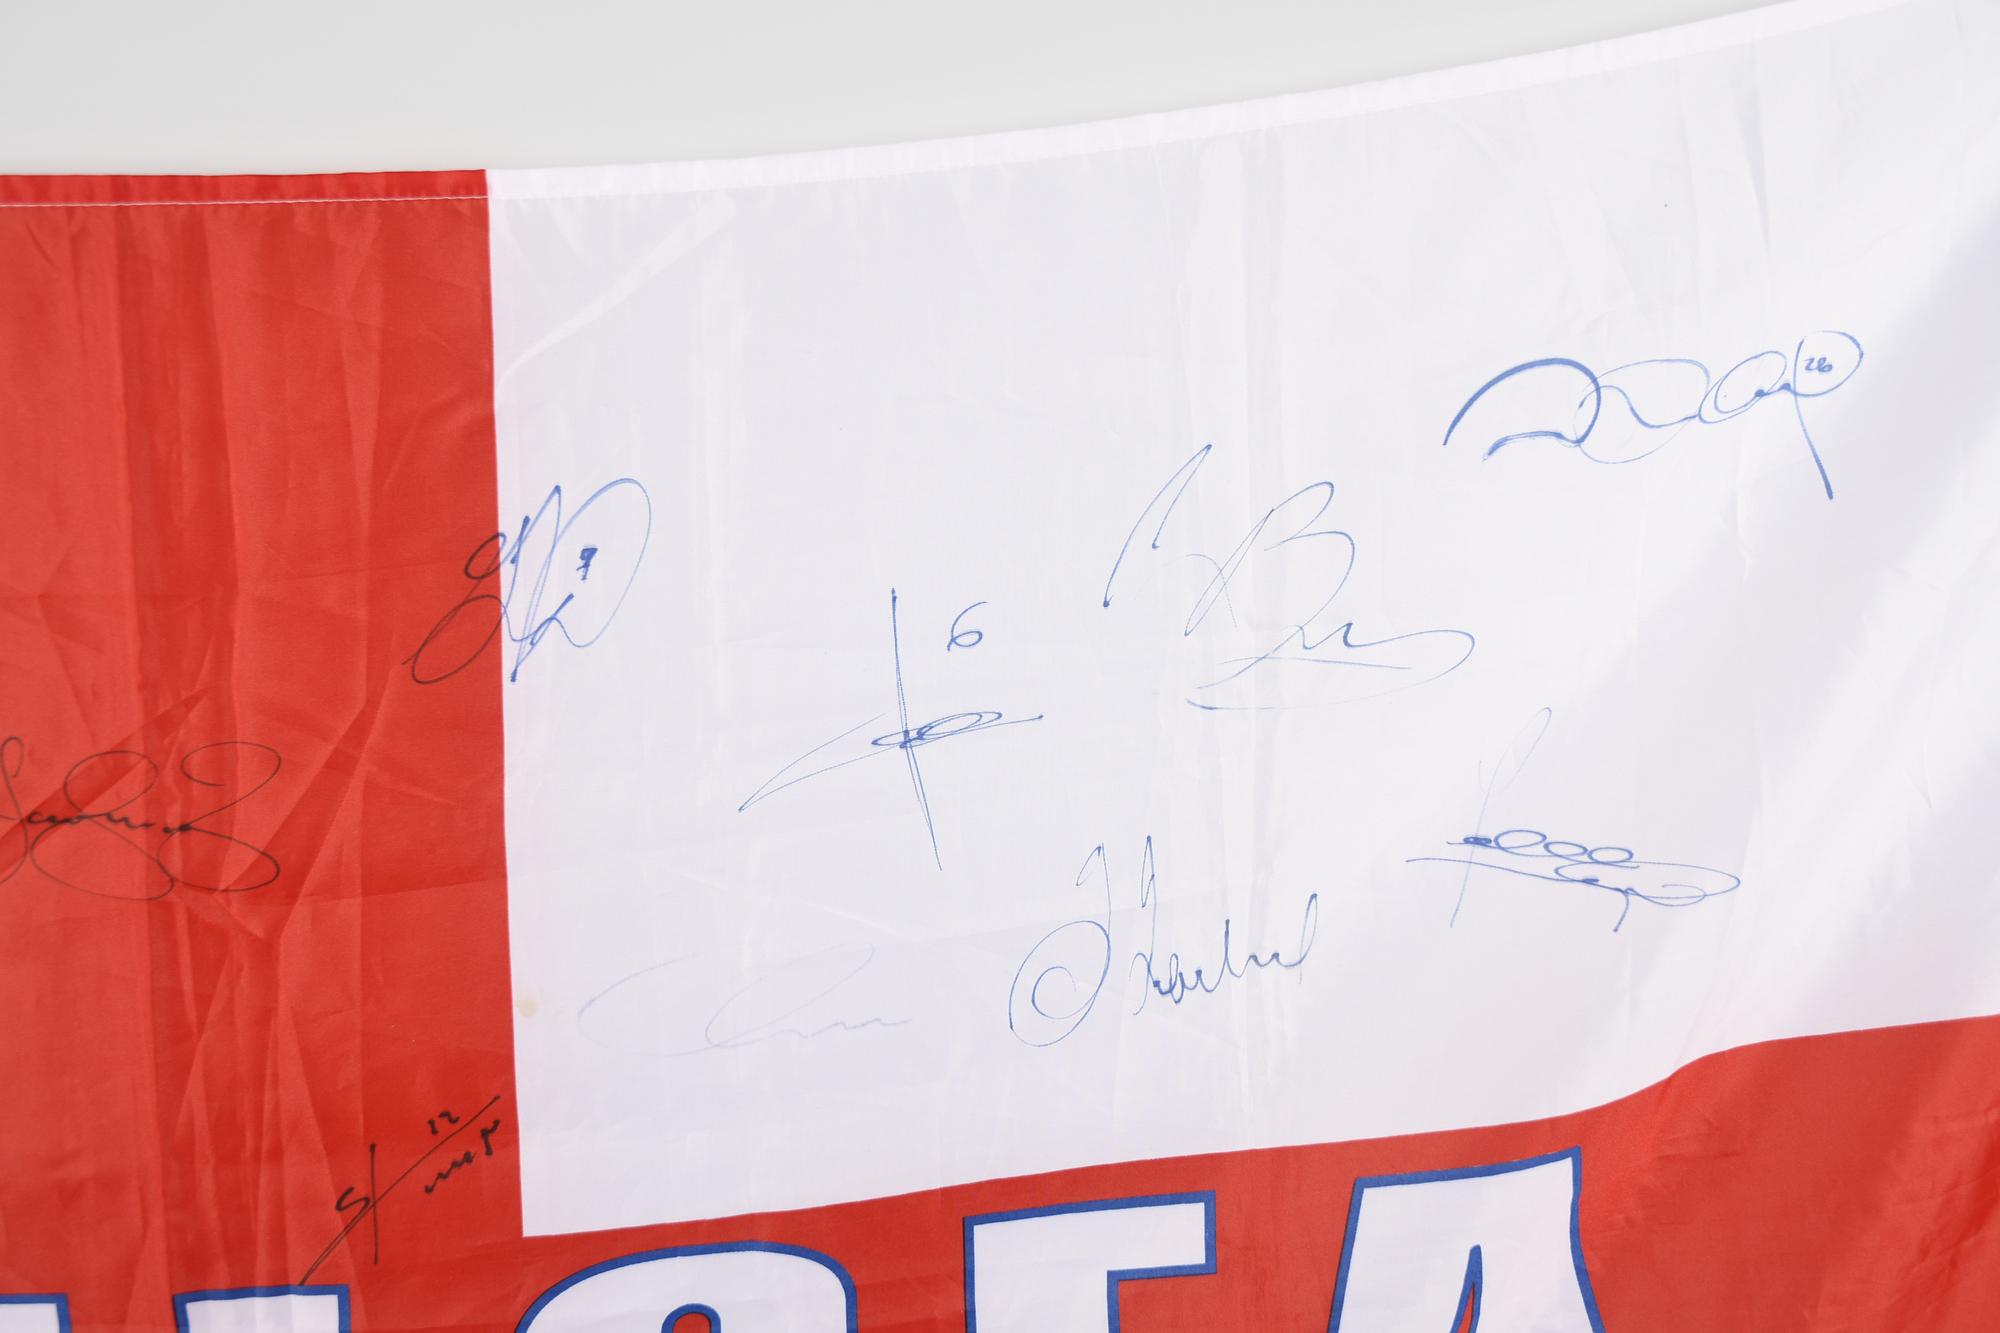 CHELSEA STARS & SIGNED FLAG Original Signature - Image 7 of 11